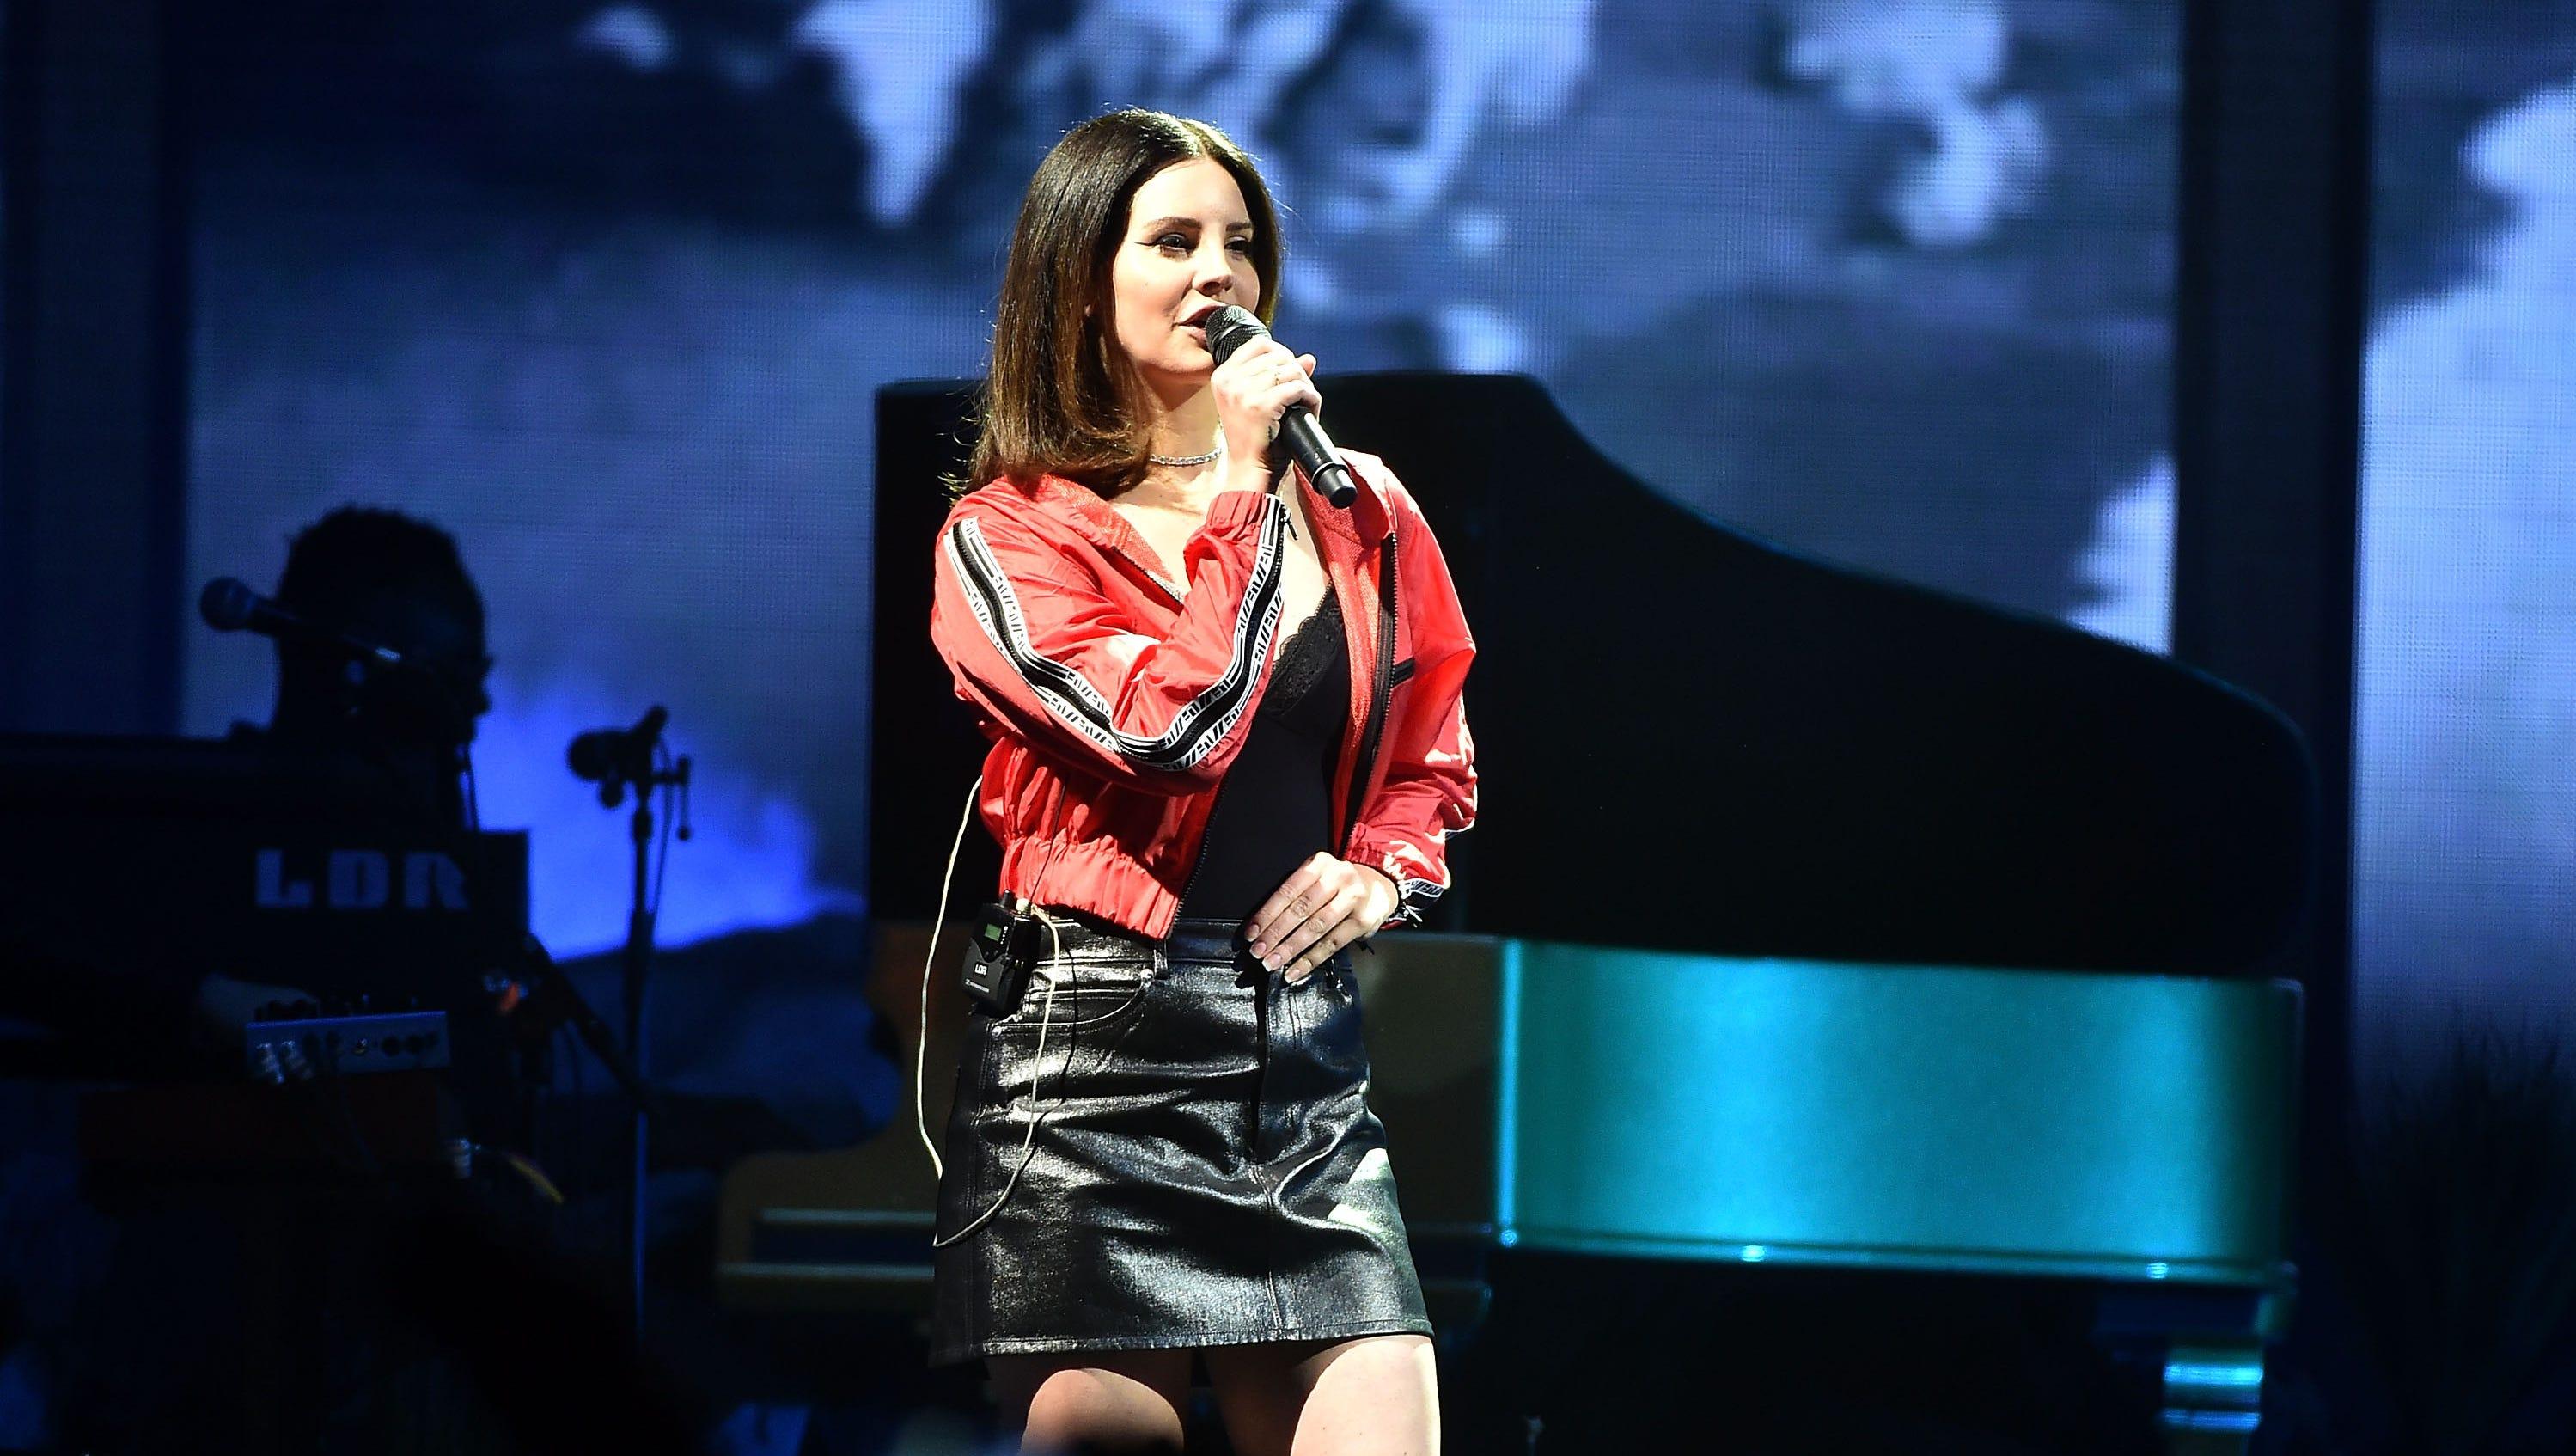 Lana Del Rey In Nashville Nfr Tour Stop Coming In November